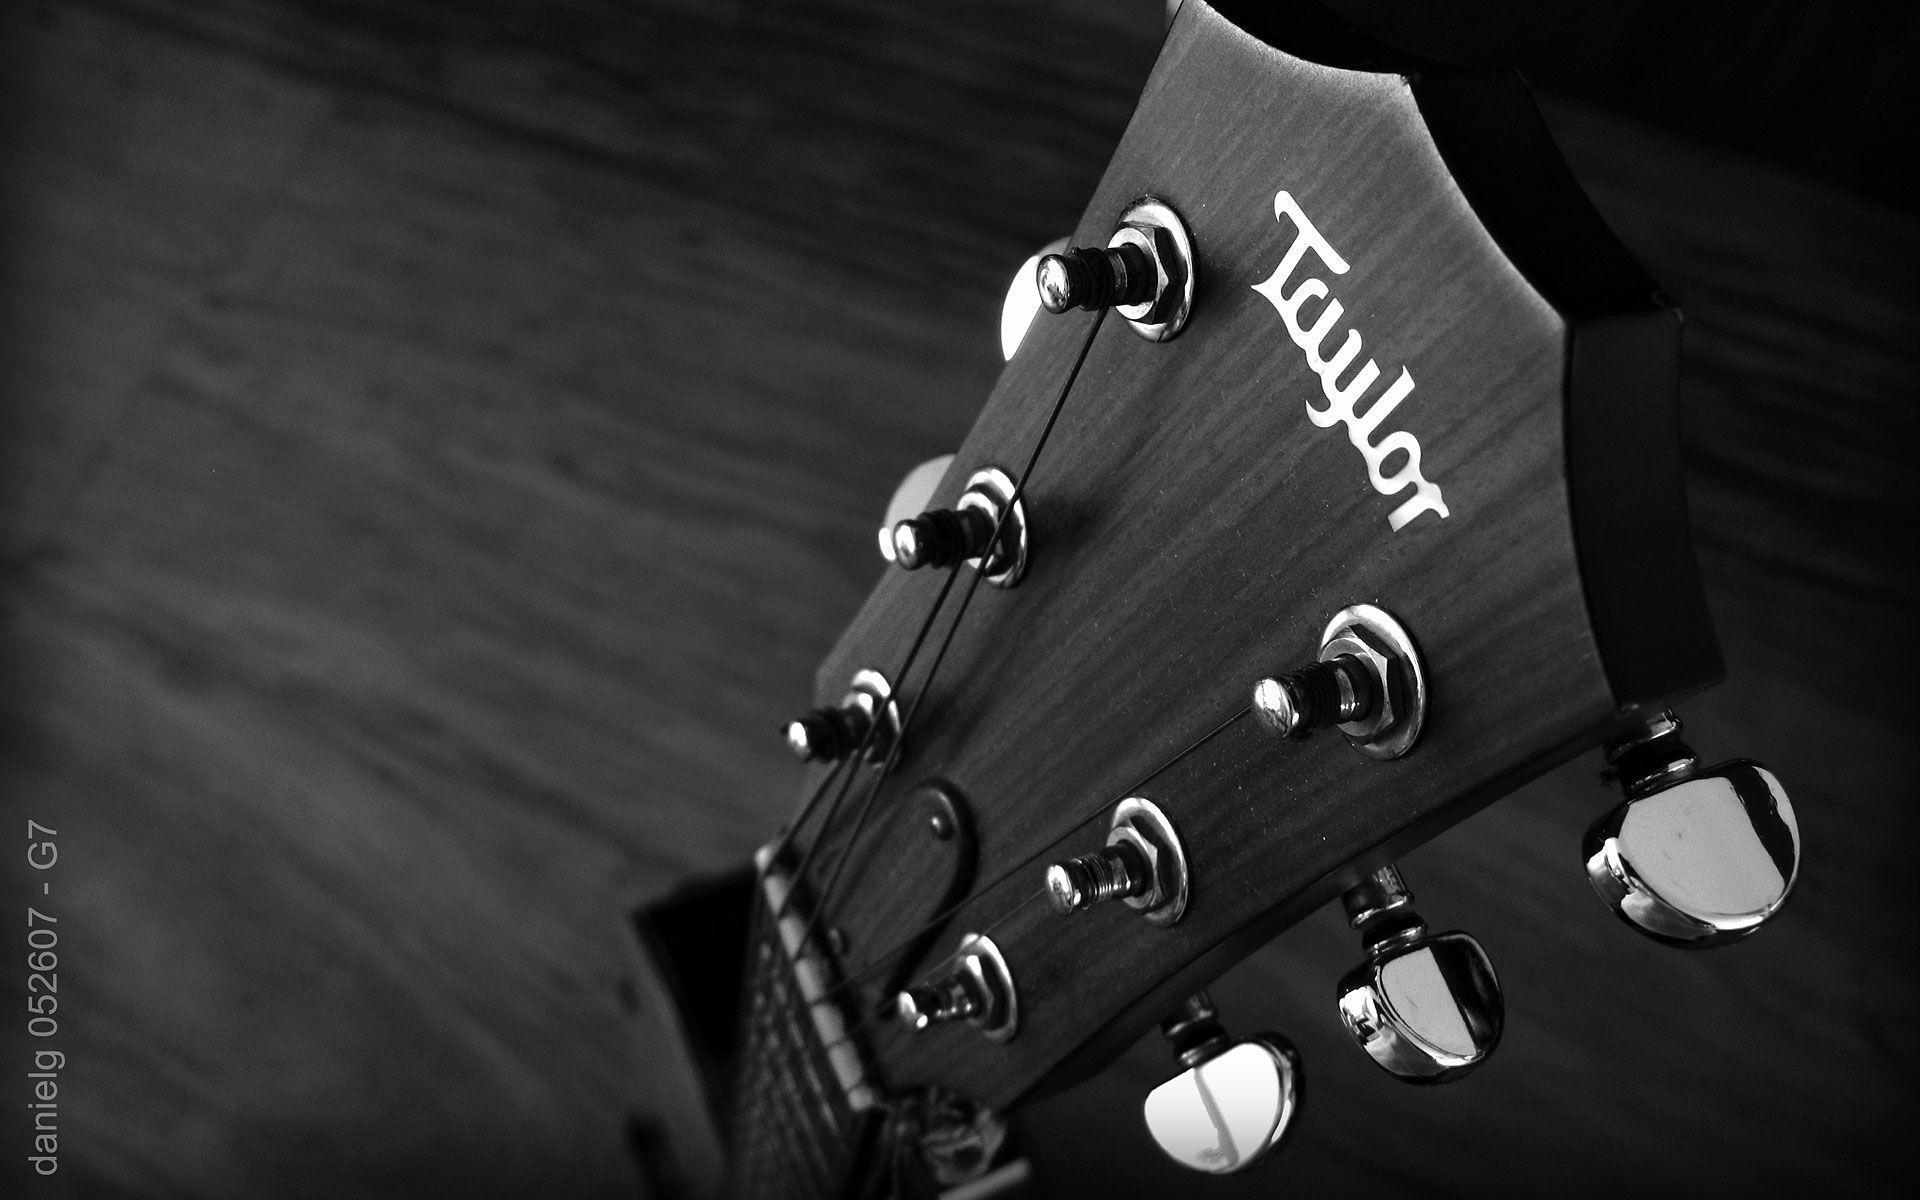 taylor guitars wallpapers - photo #23